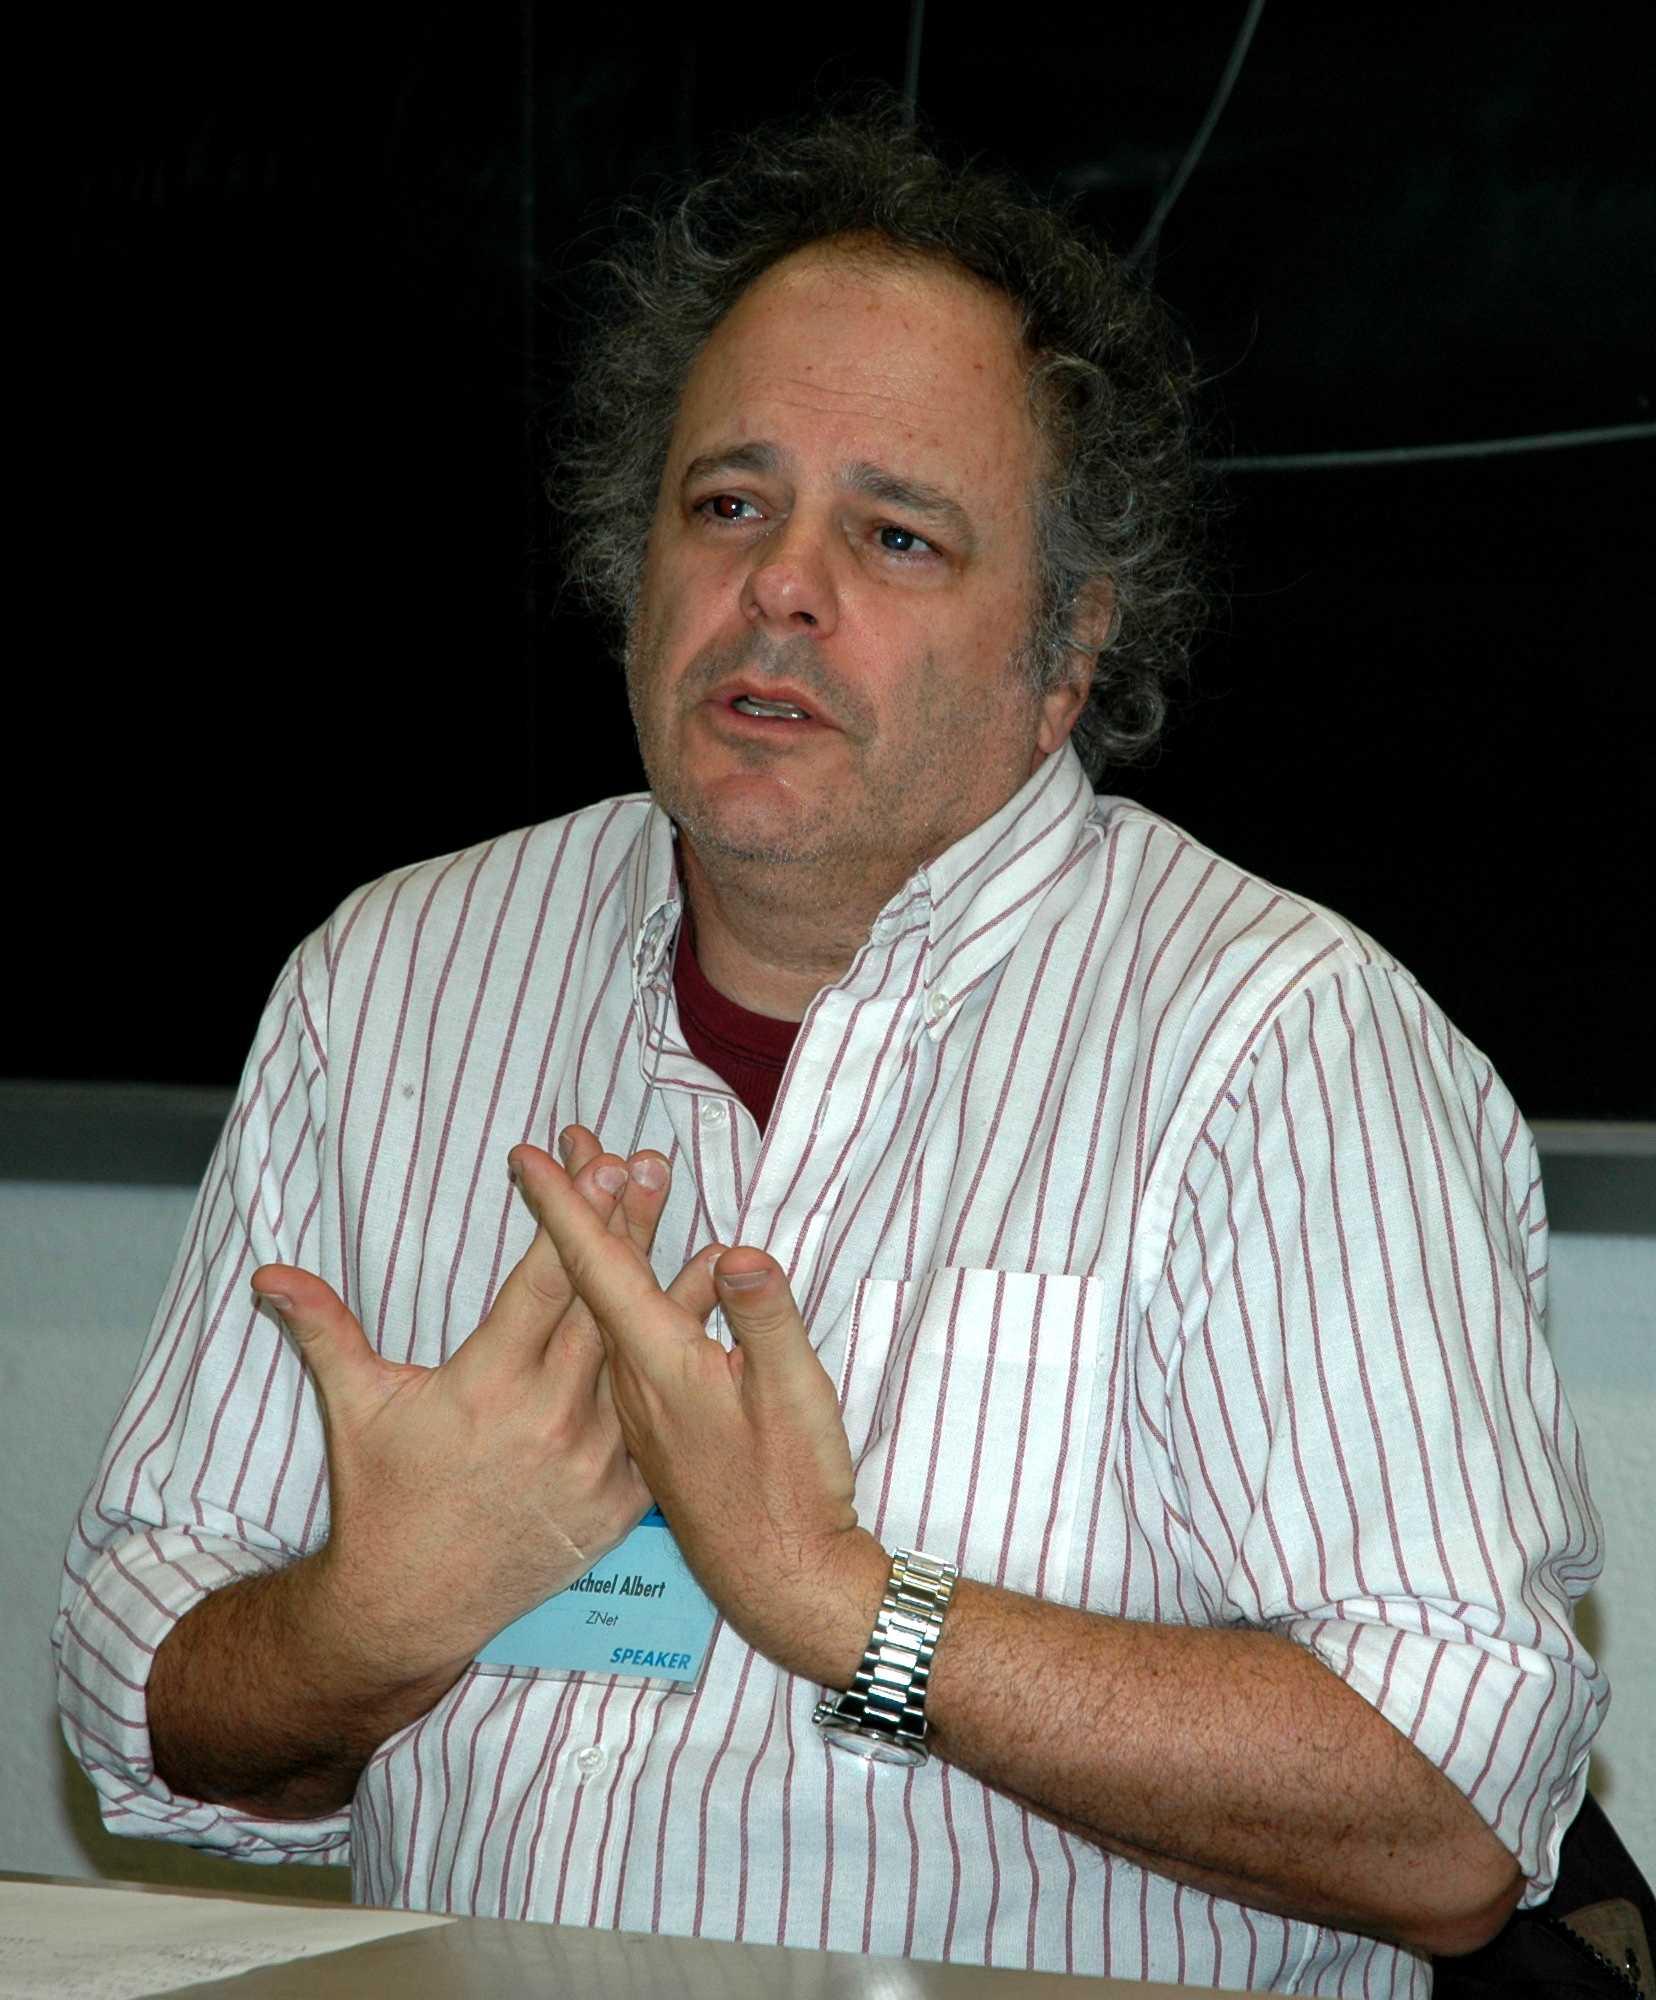 Michael Albert al New York's Annual Left Forum (11 de març de 2007) [Foto de Thomas Good]